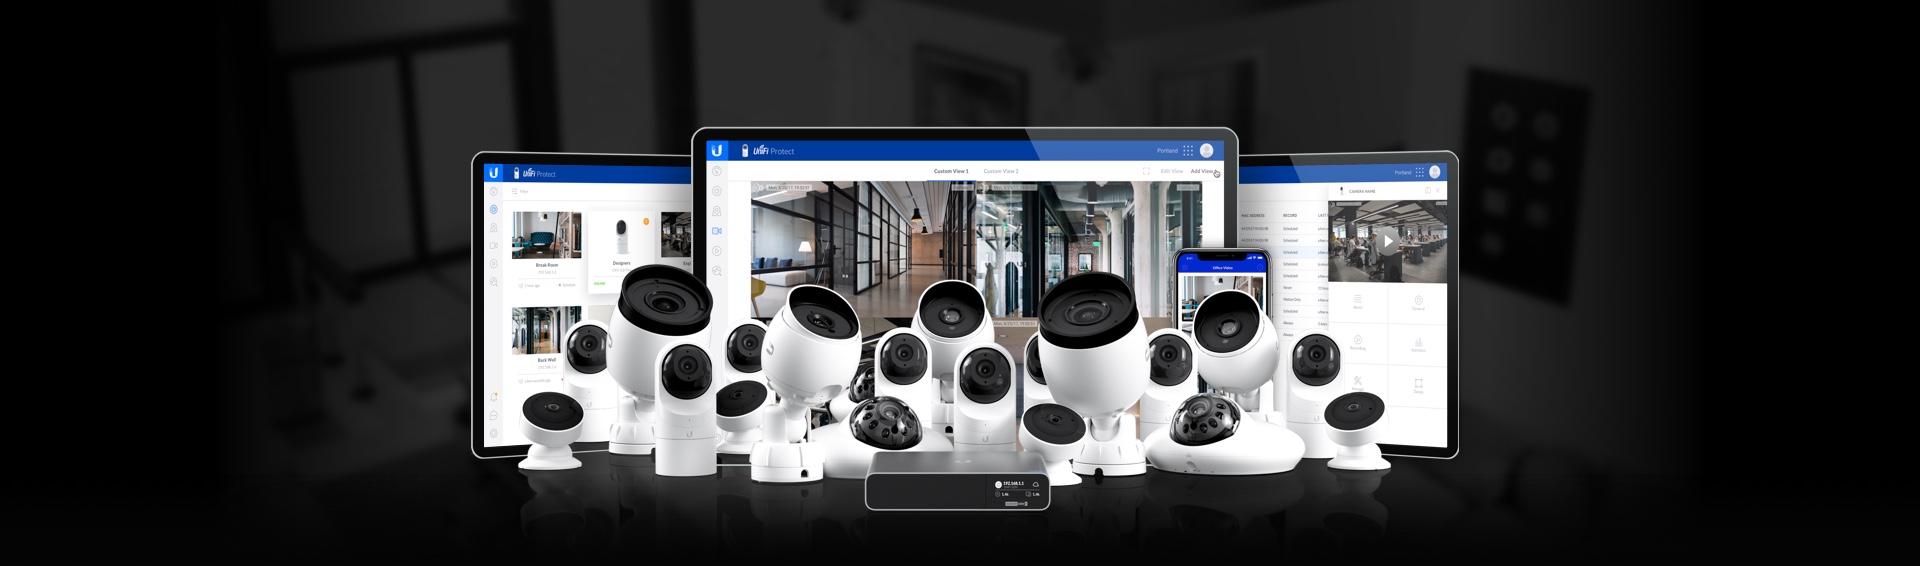 Ubiquiti Networks - Democratizing Professional Network Technology 4116515d7c